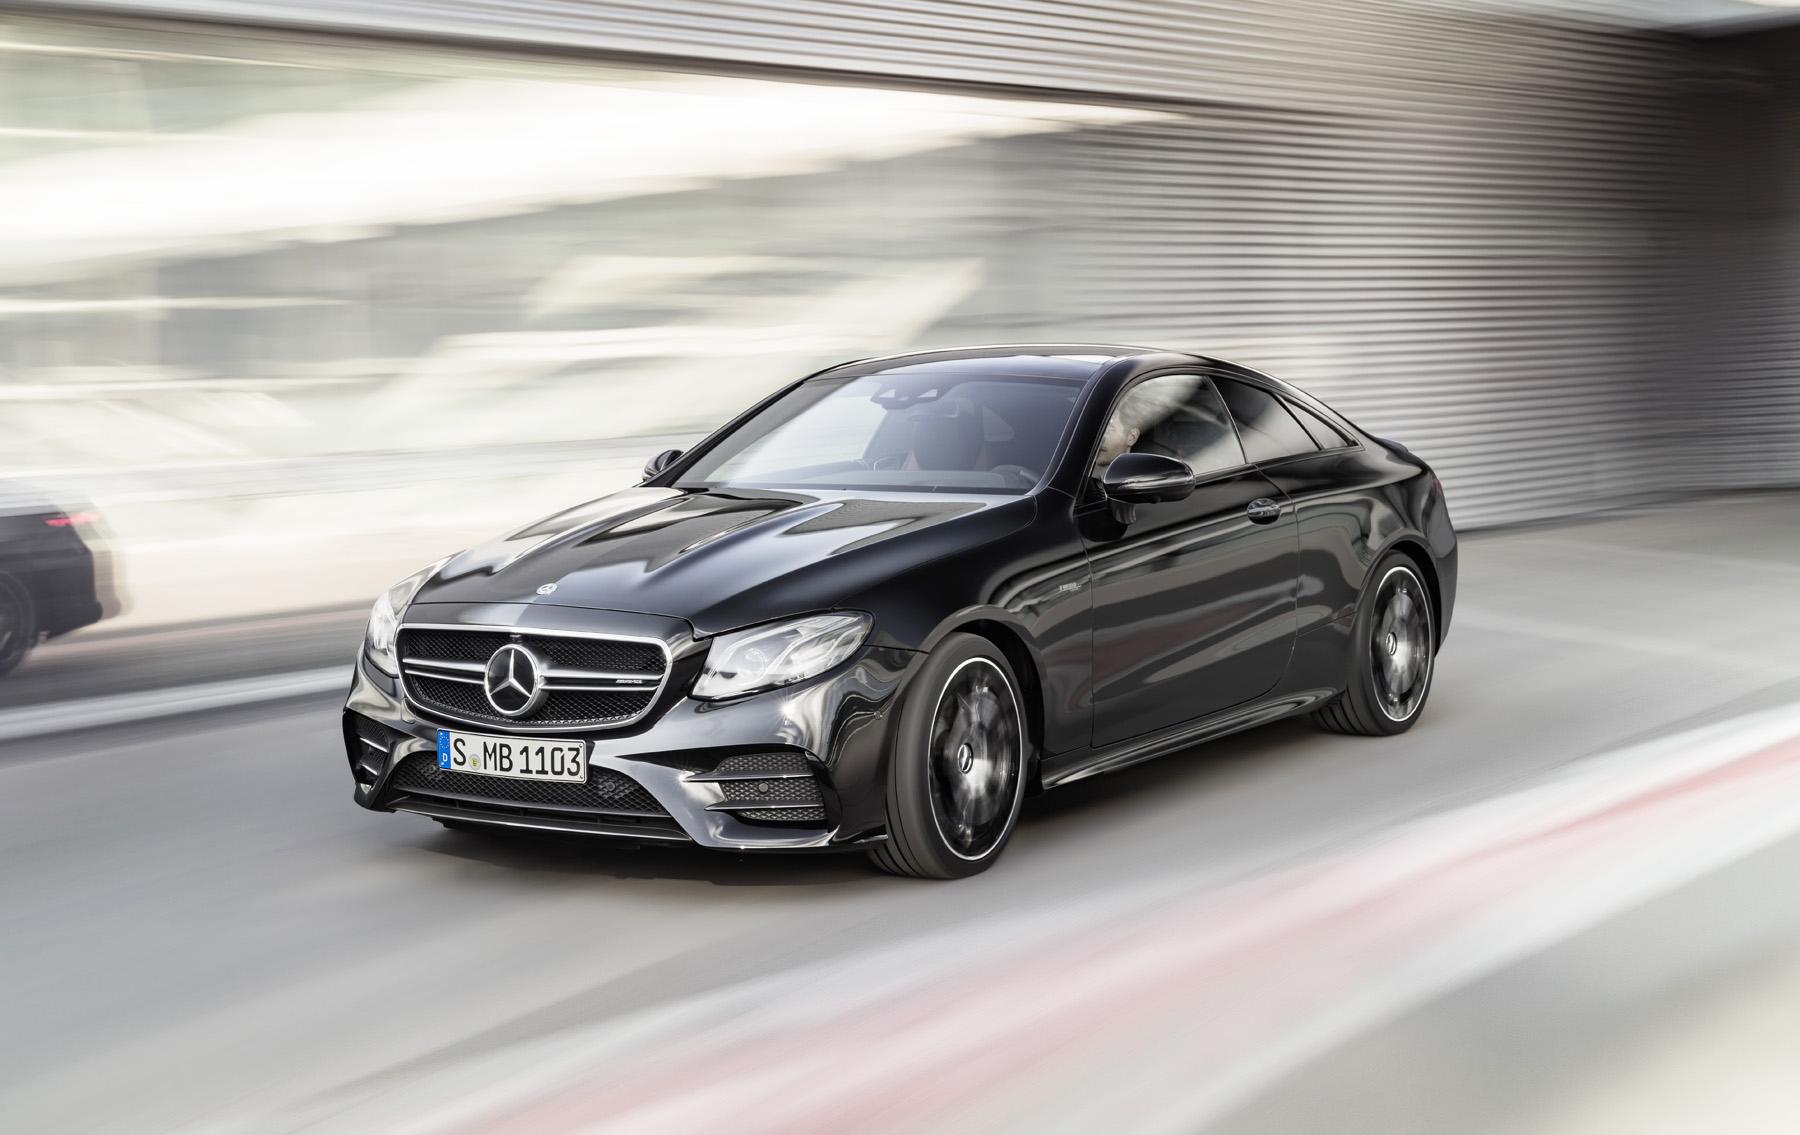 Mercedes-AMG 53 Models Announced